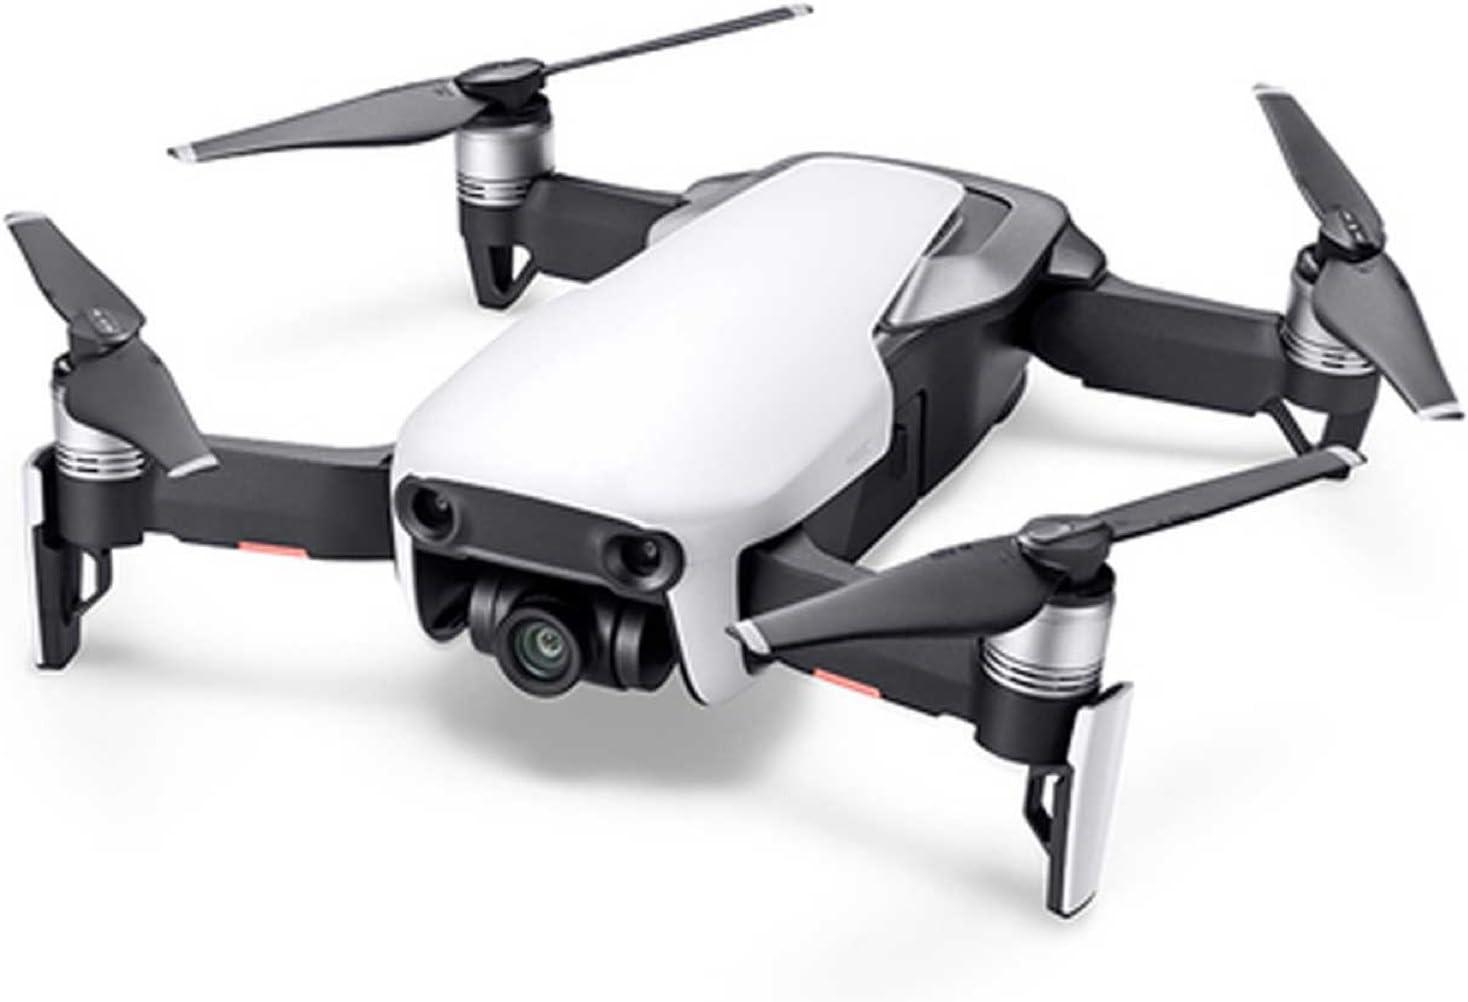 DJI Mavic Air Fly More Combo Arctic 4k Drone Electronics, White (CP.PT.00000165.01)